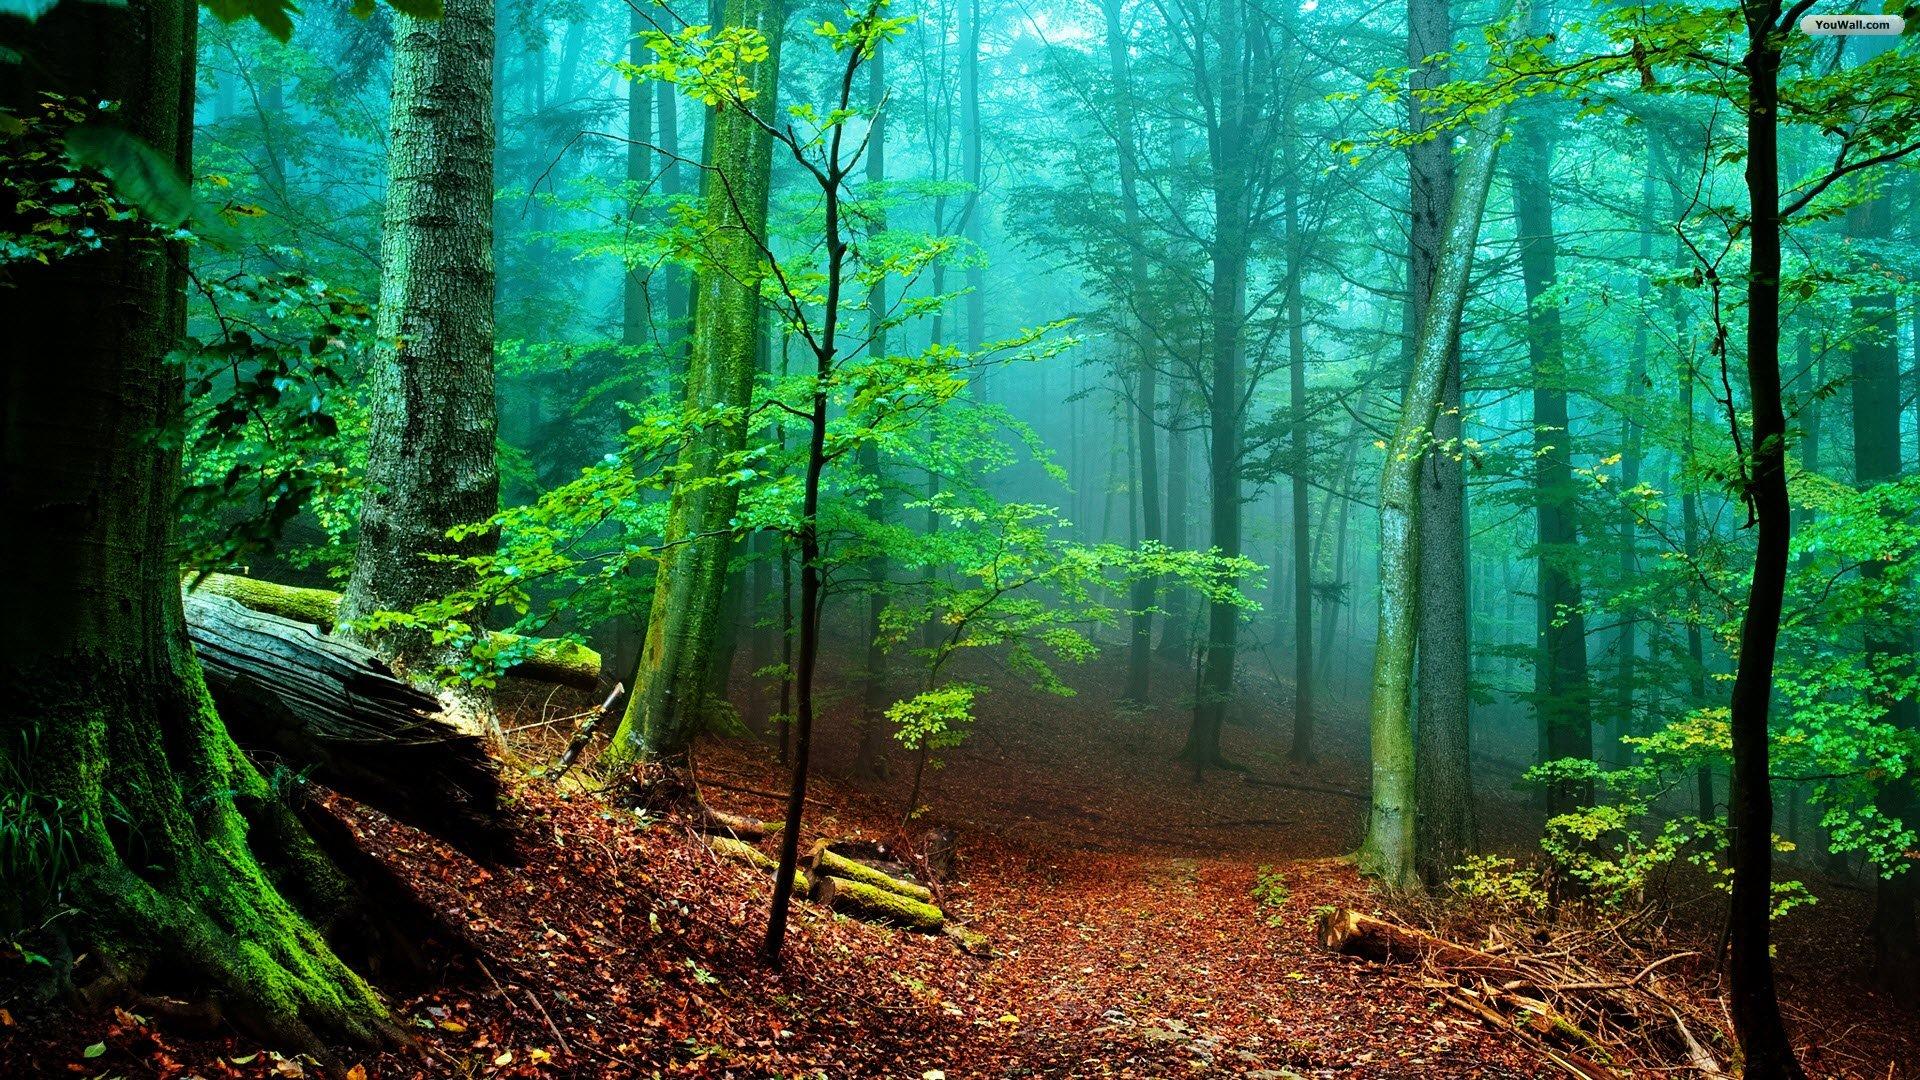 Wallpaper Backgrounds Fall Forest Backgrounds Hd Free Download Pixelstalk Net